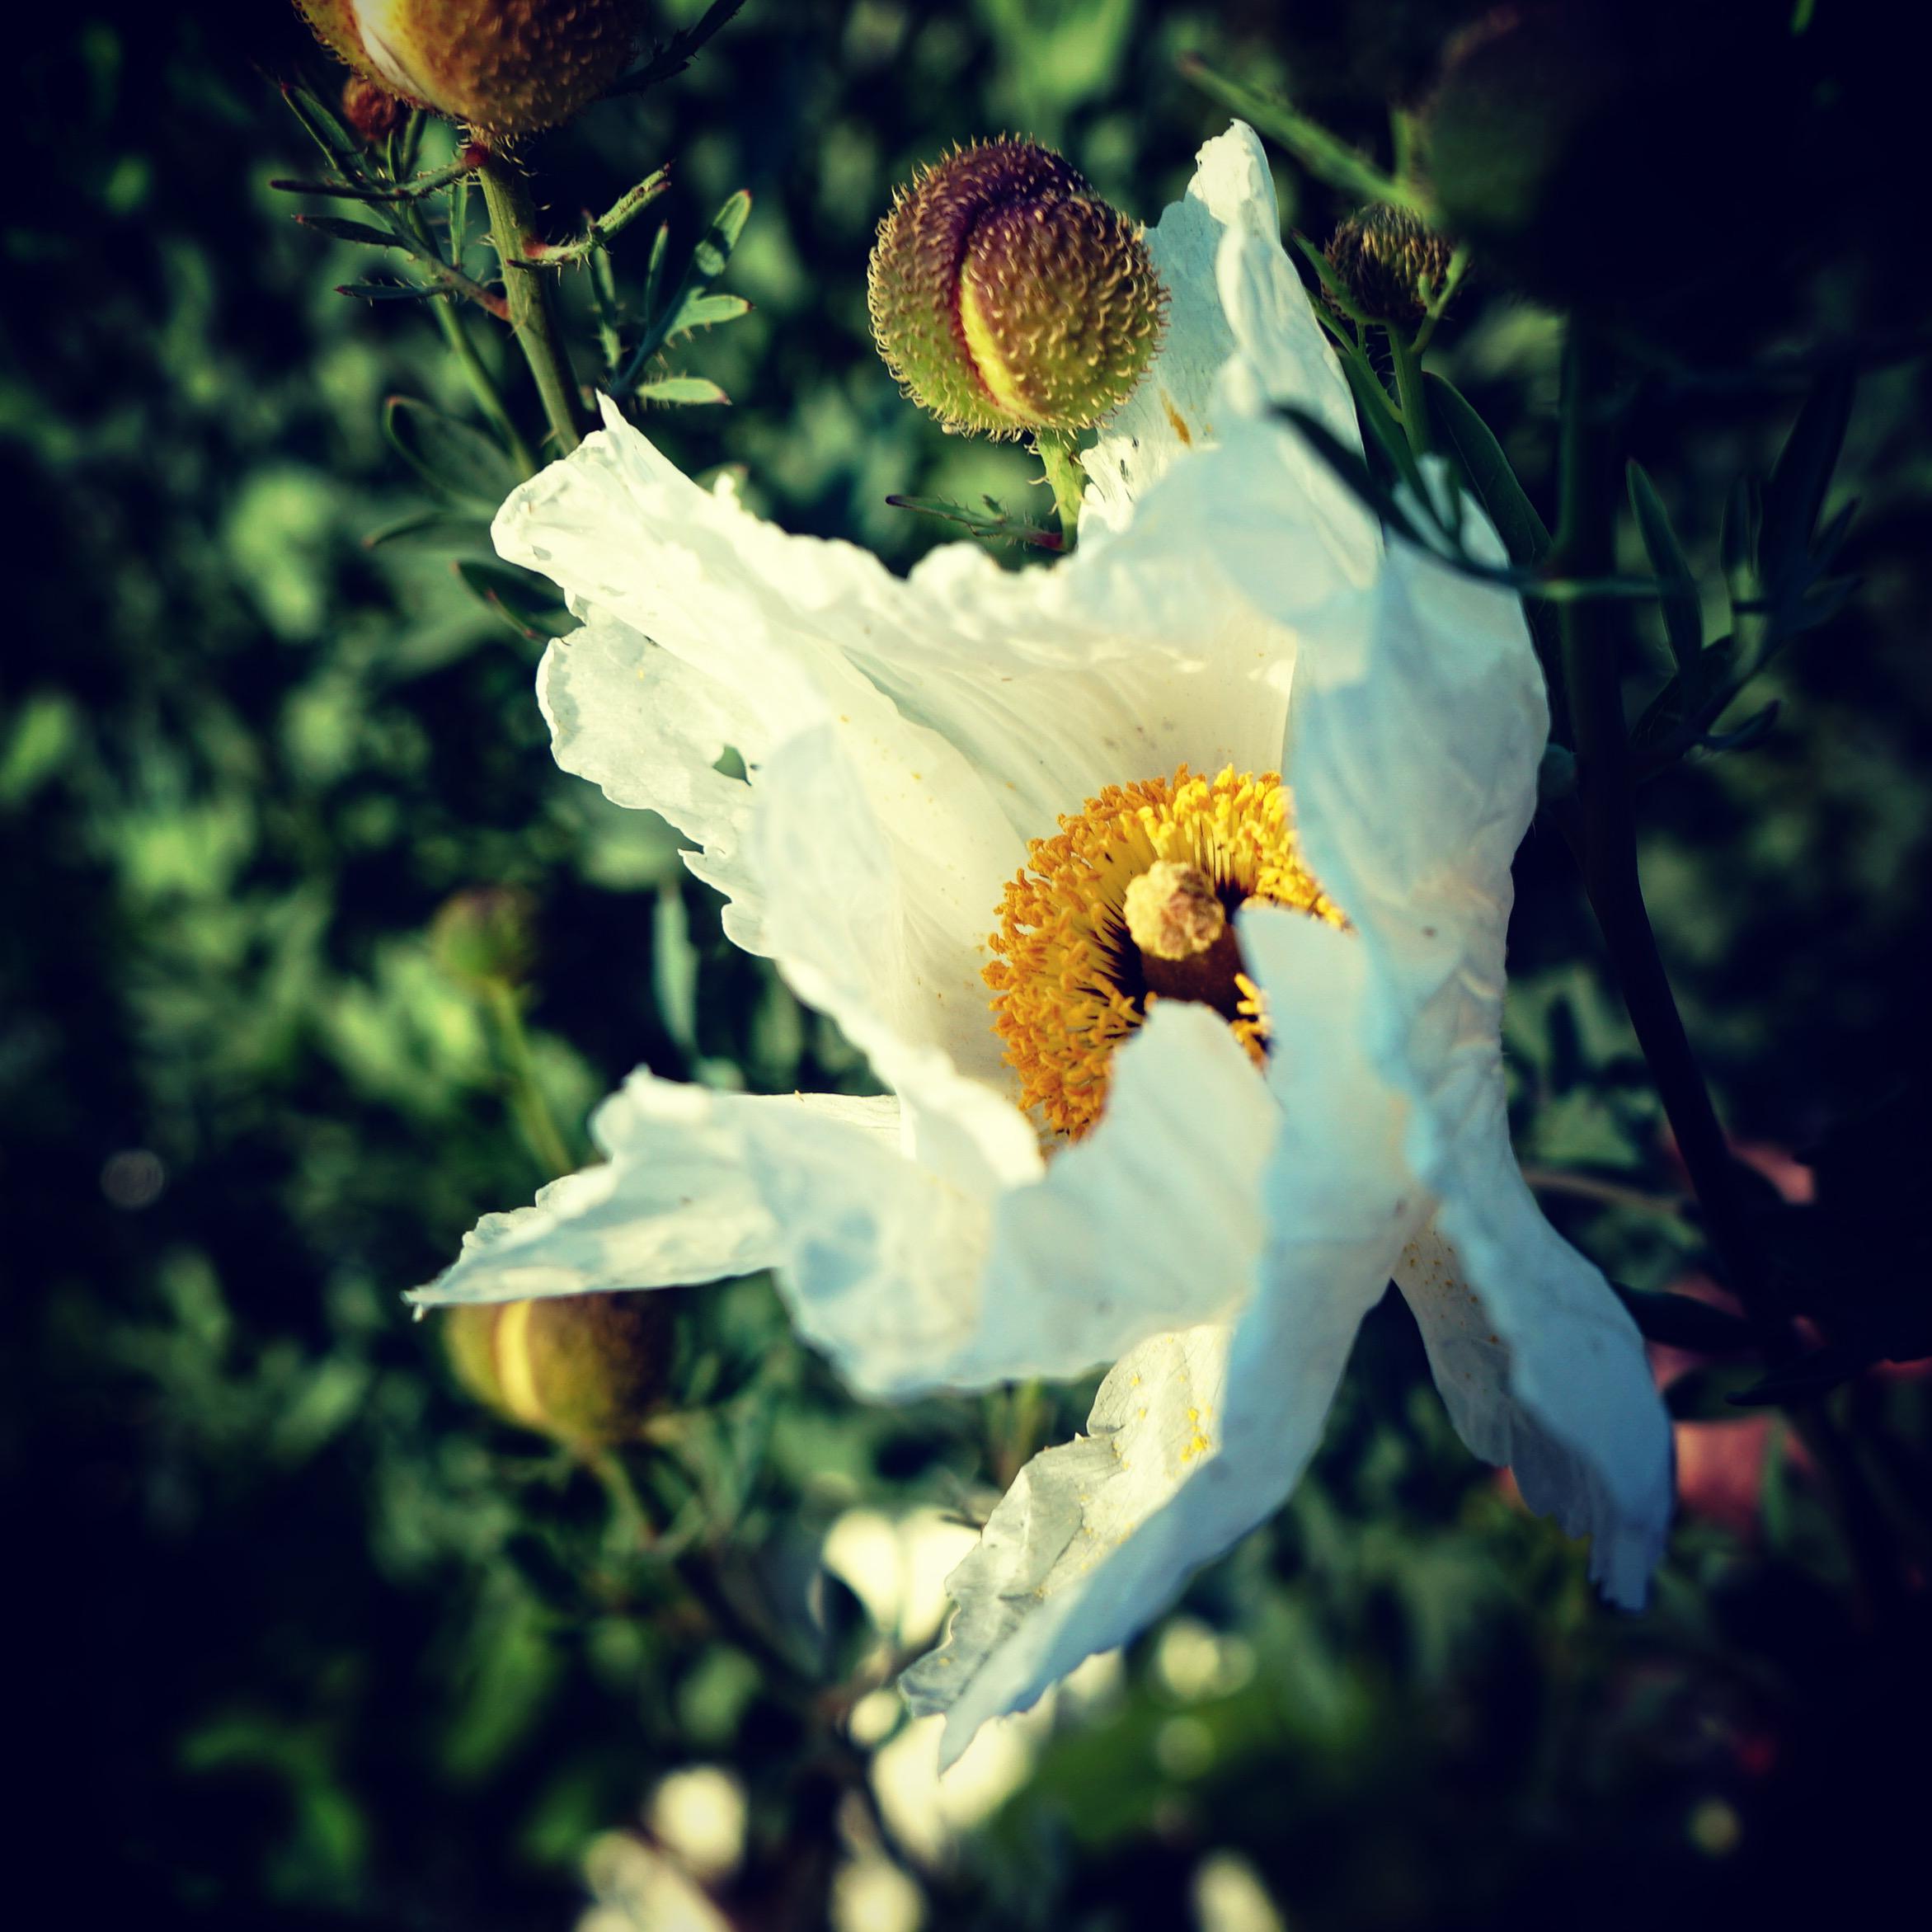 Matilija Poppy Flower in the Neighborhood via Instagram